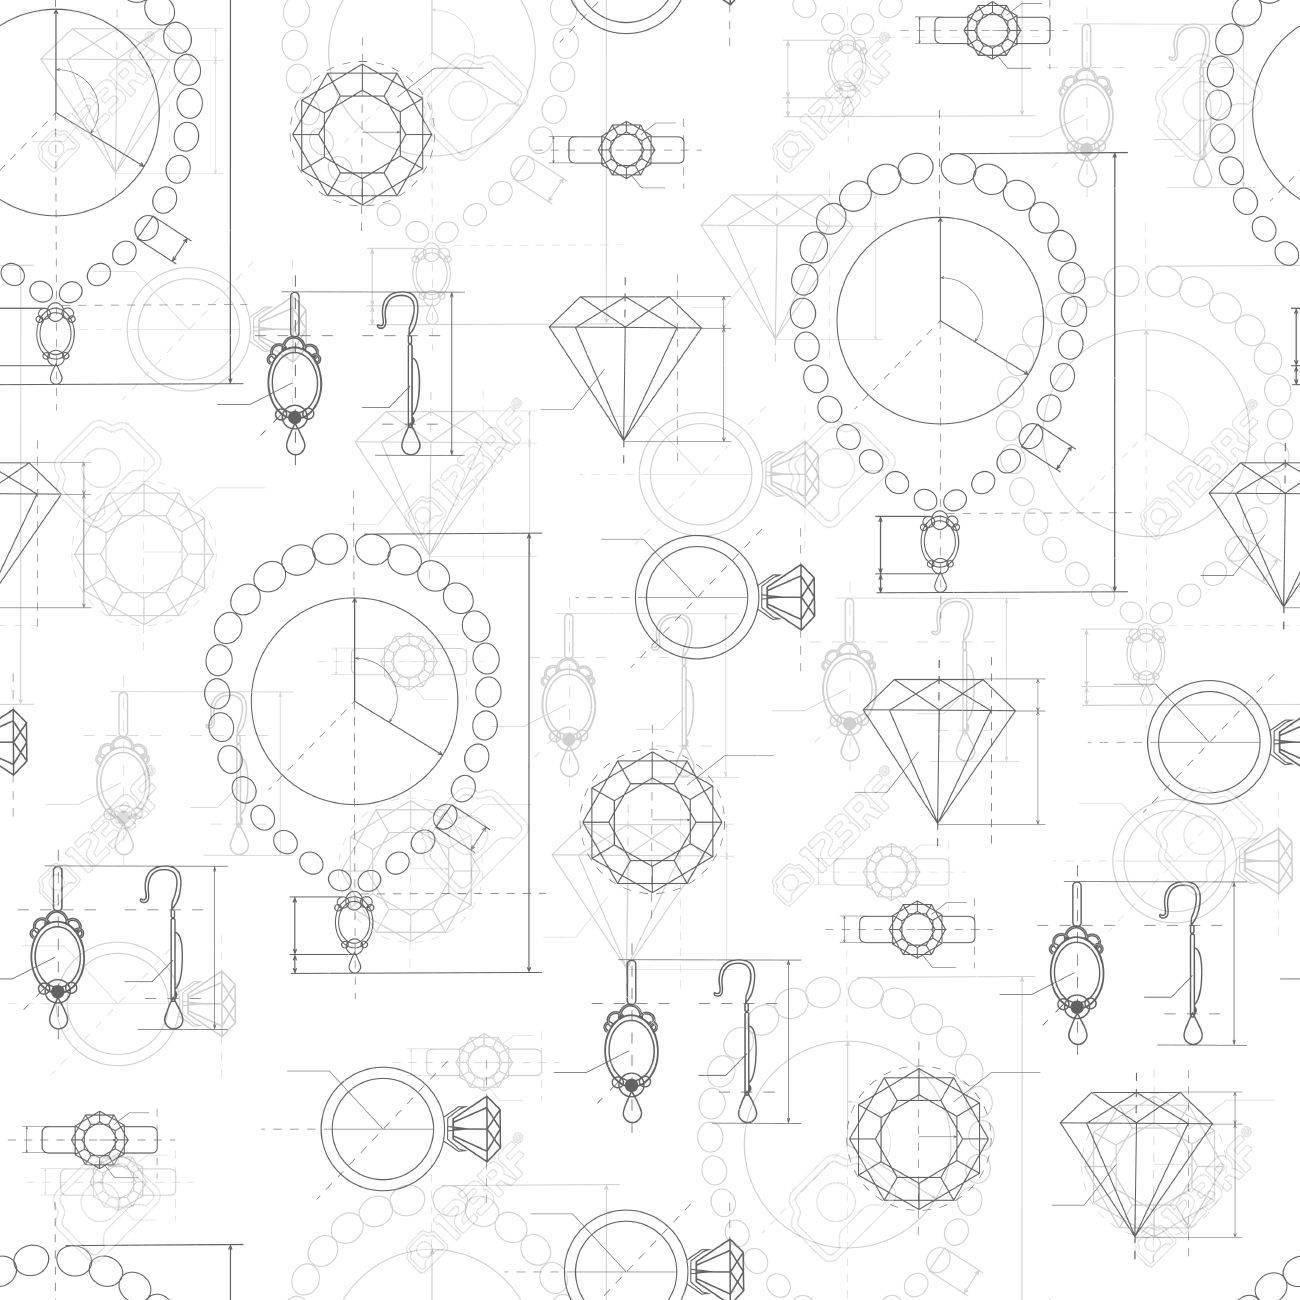 1300x1300 Jewelry Production Sketch Seamless Pattern. Hand Drawn Sketch